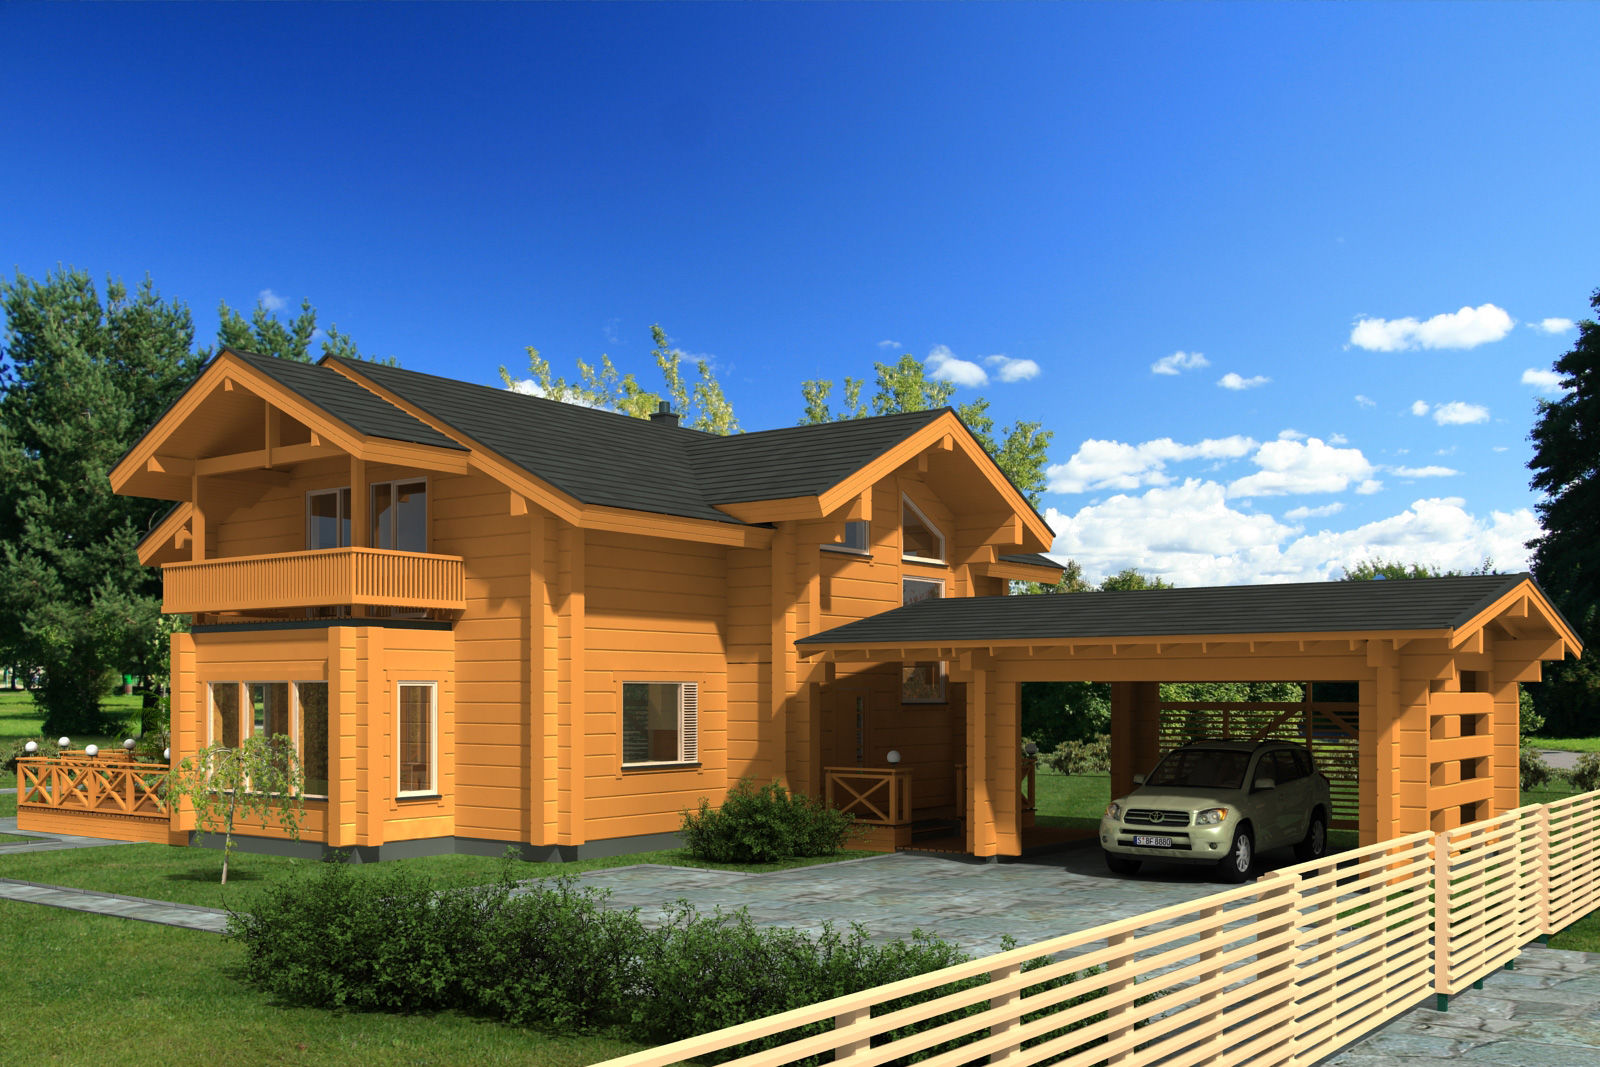 Casa Prefabricada Clasica Con Armazon De Madera De 2 Plantas